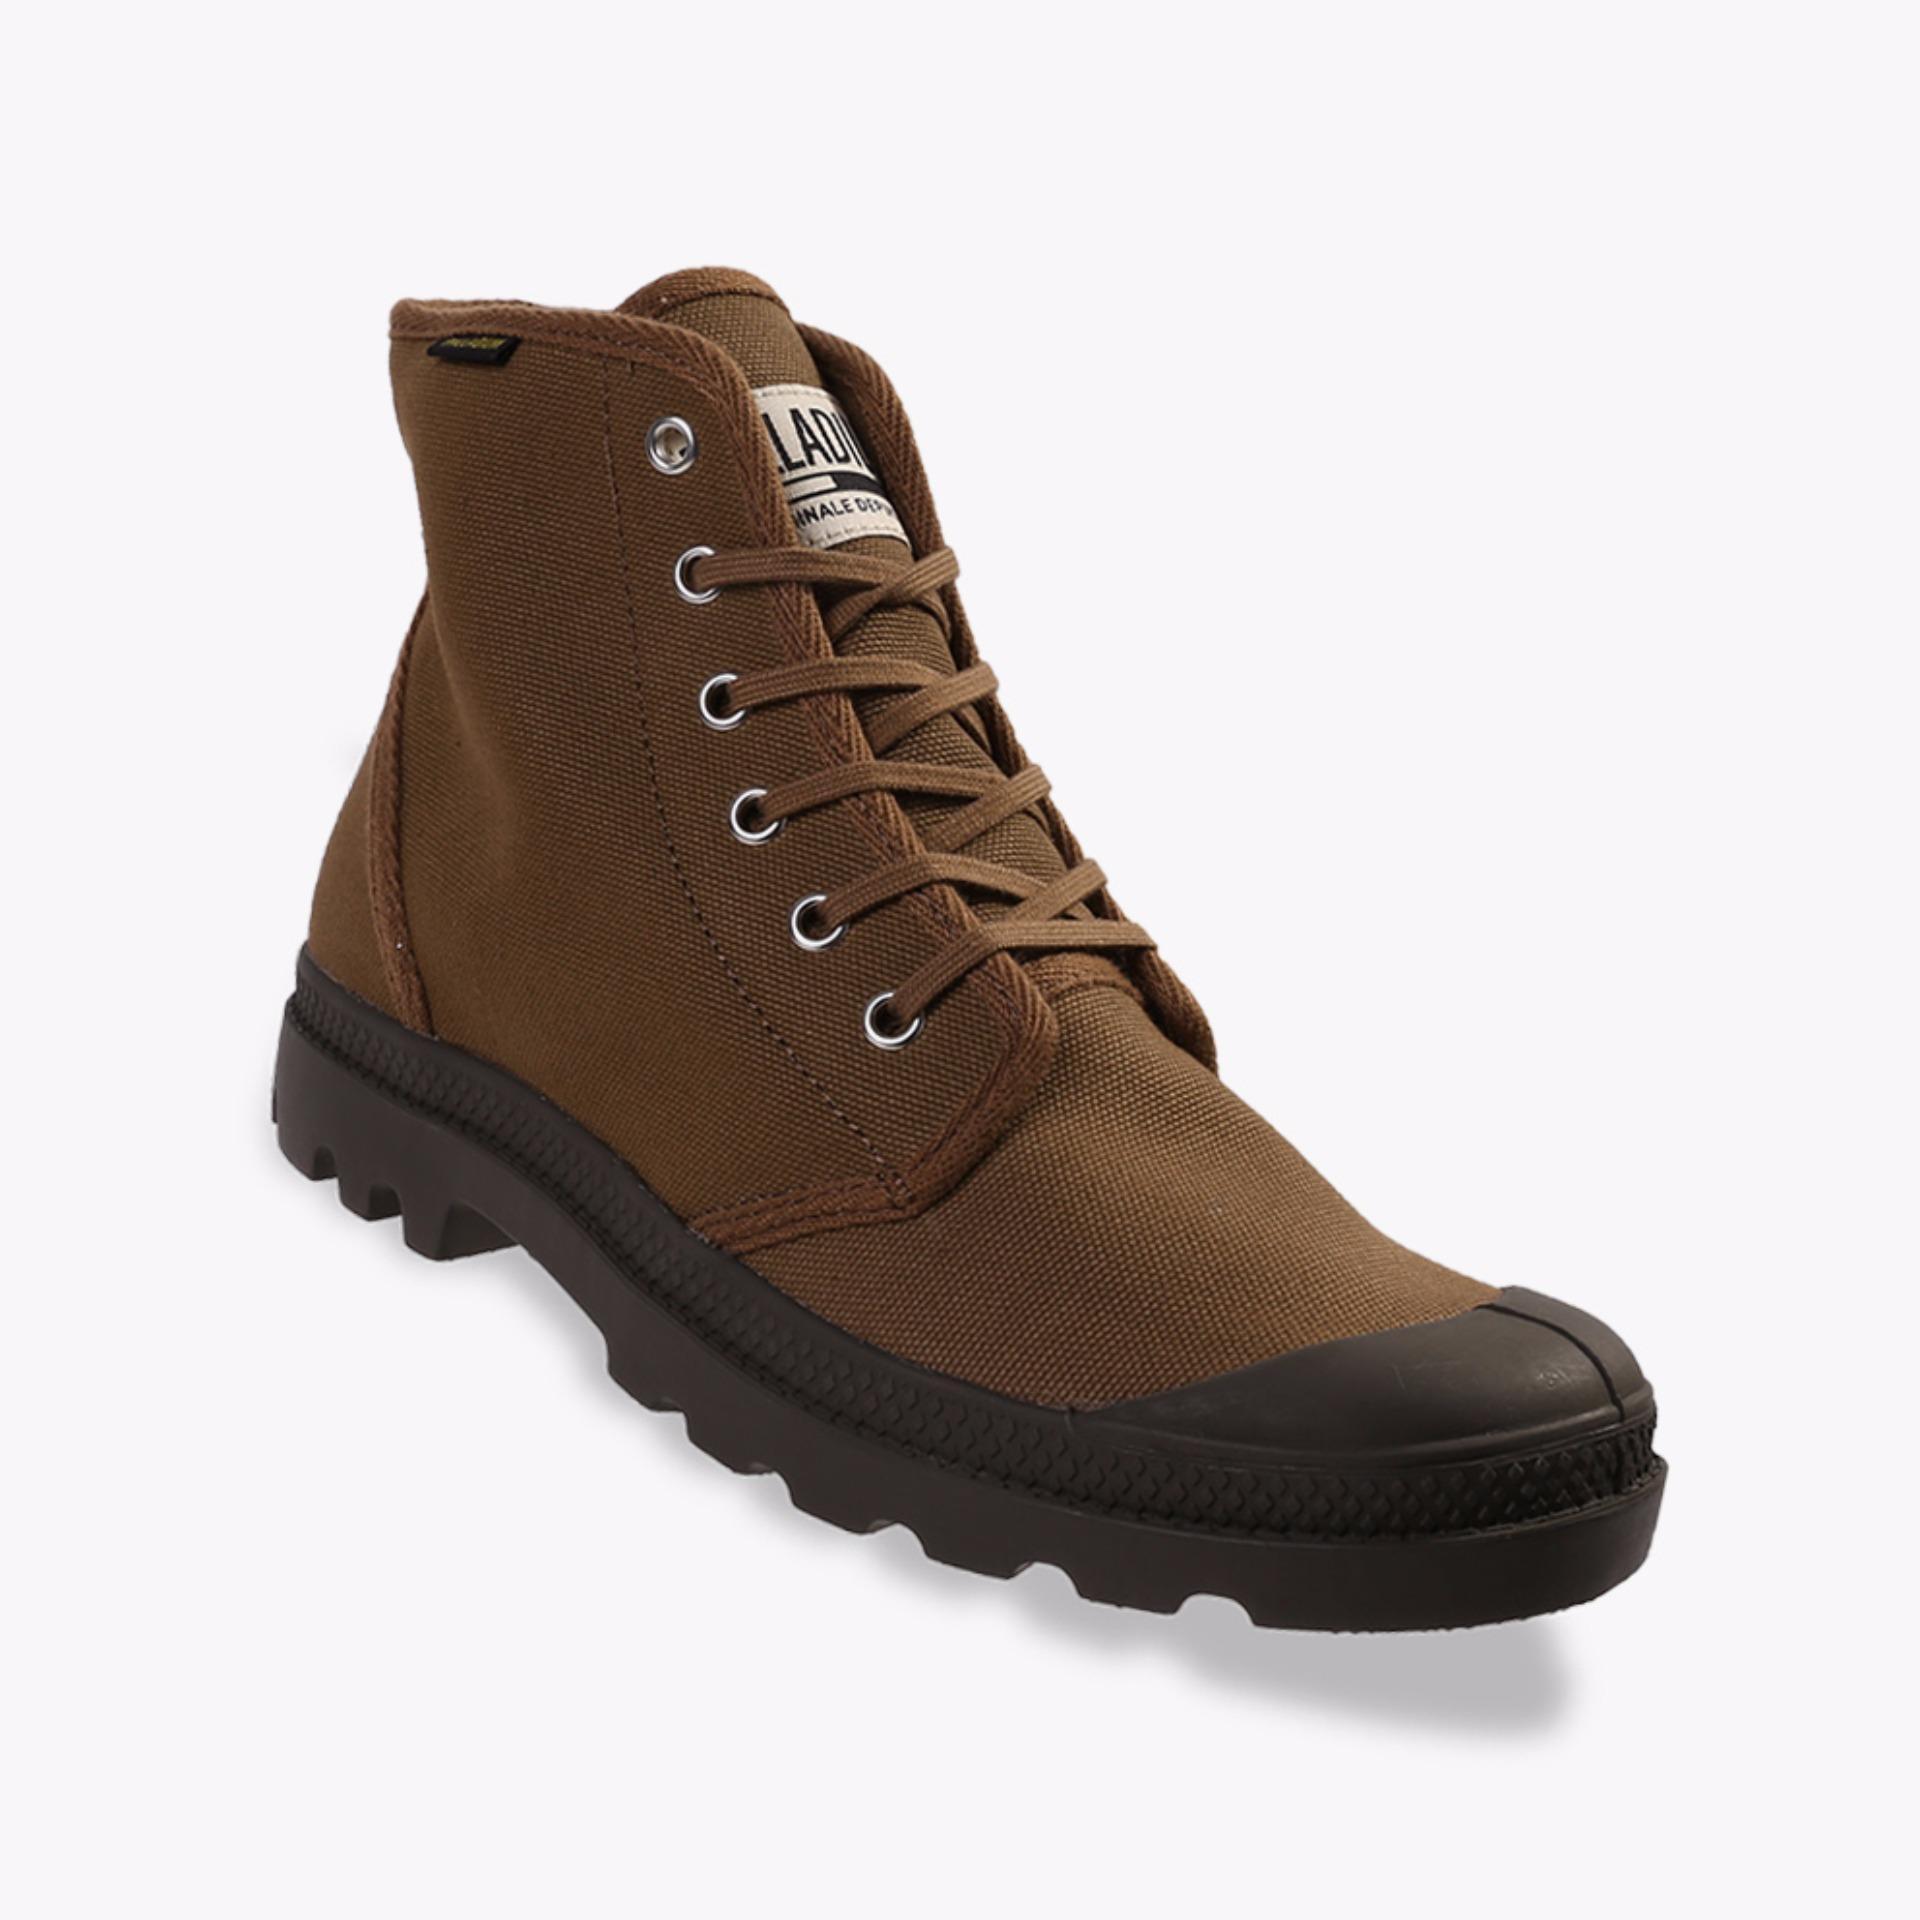 Palladium Pampa Hi Originale Unisex Boots Shoes - Cokelat